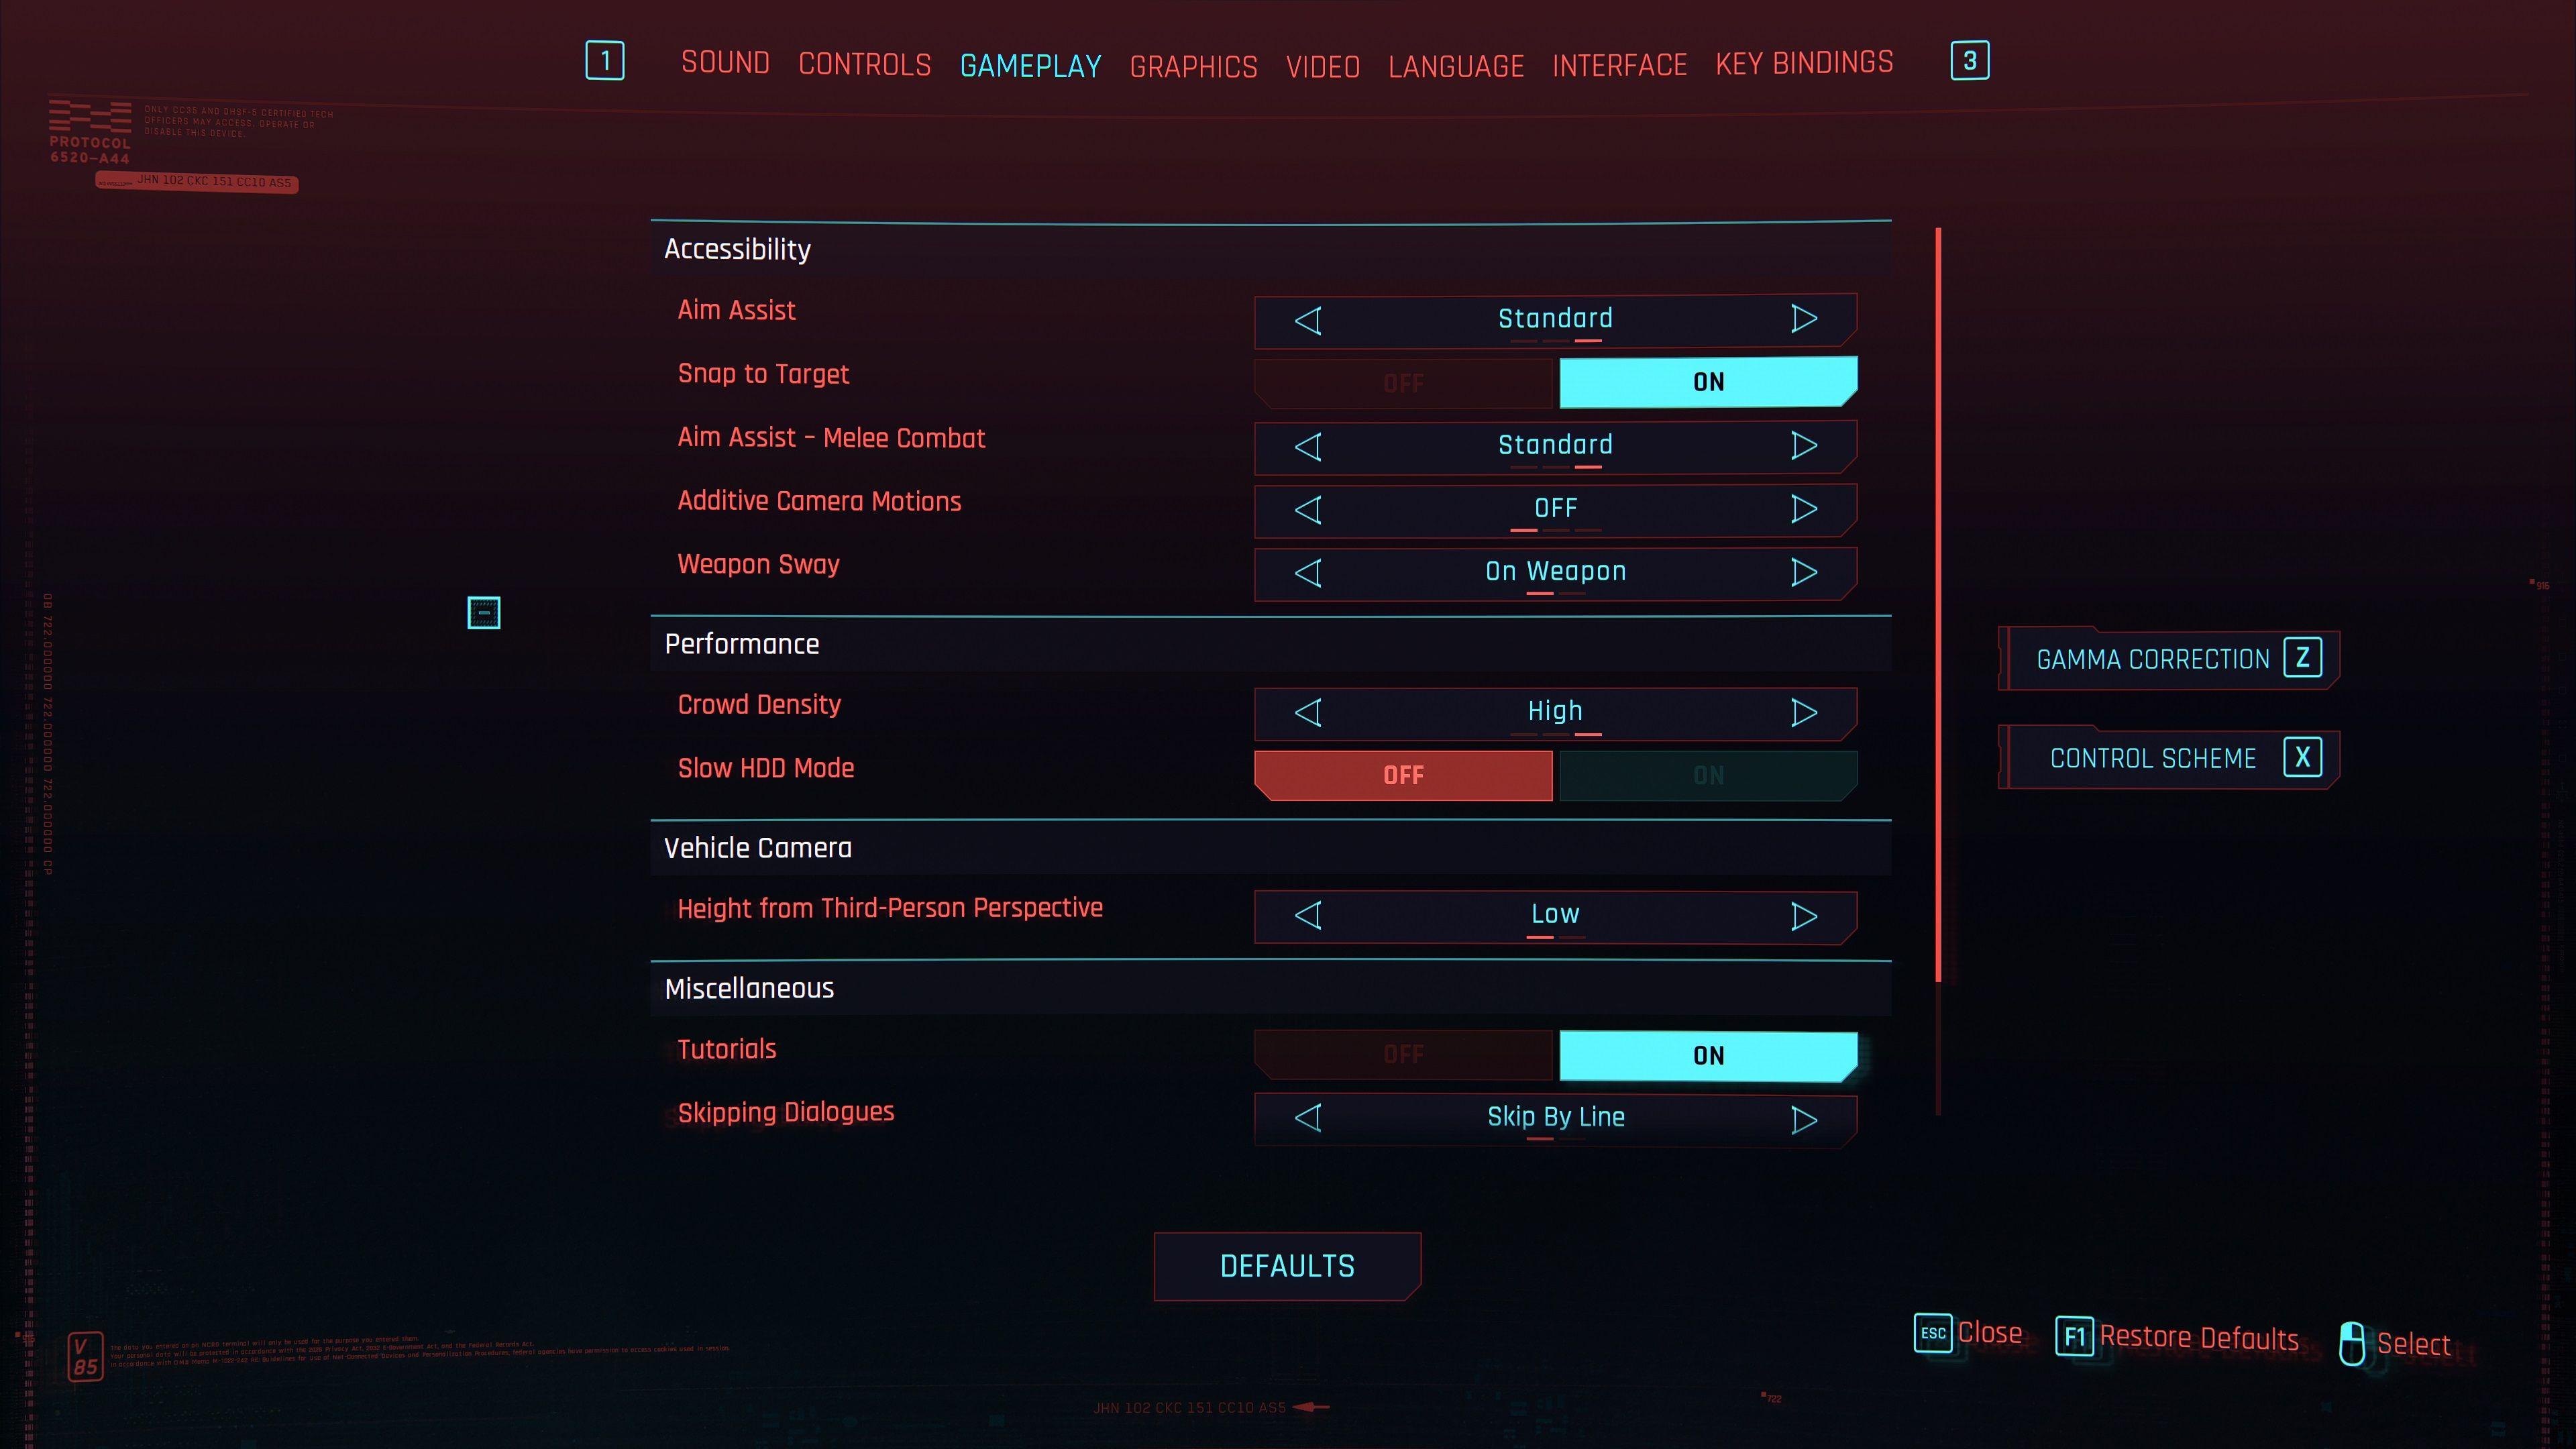 cyberpunk 2077 accessibility